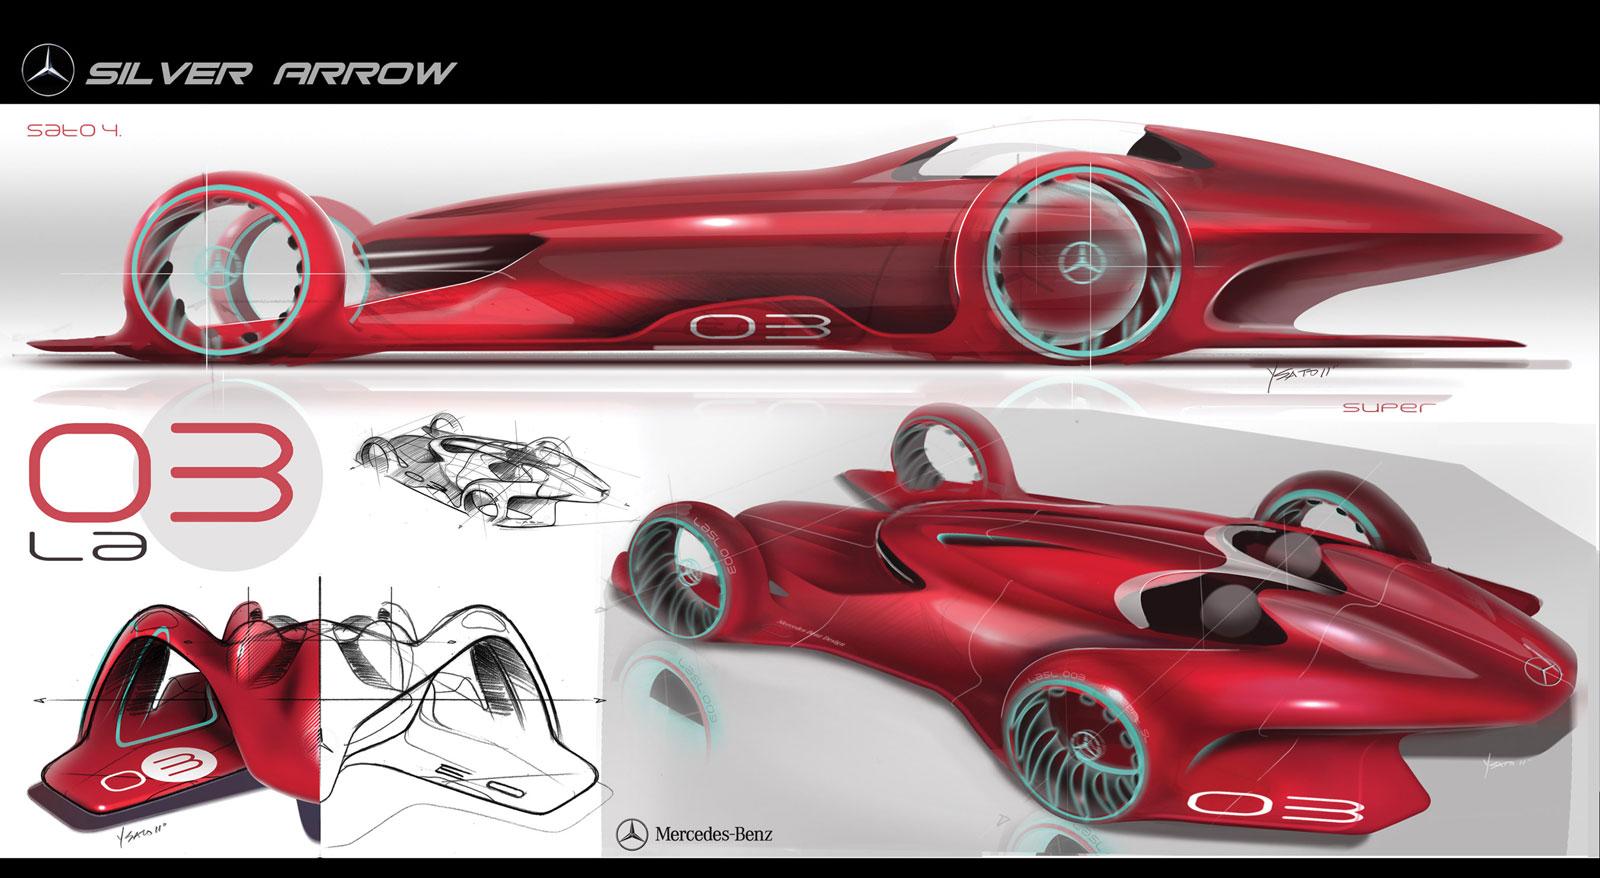 La design challenge 2011 mercedes benz silver arrow for Mercedes benz design